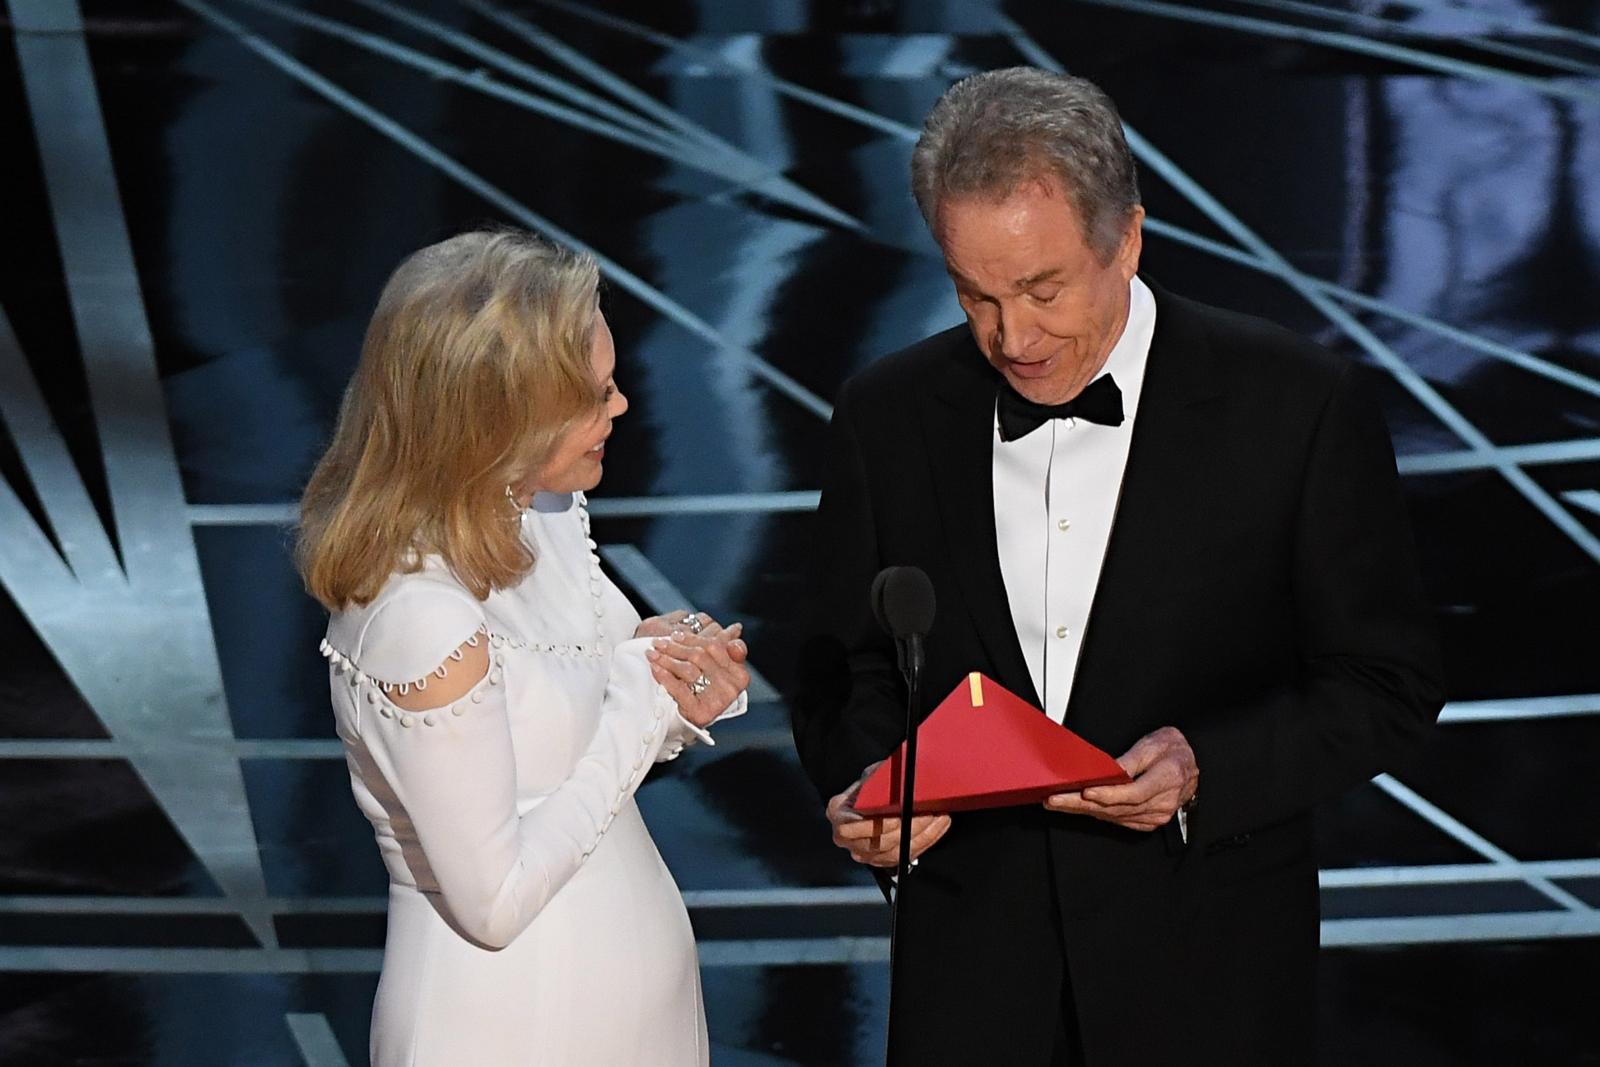 Oscars 2017 Faye Dunaway and Warren Beatty